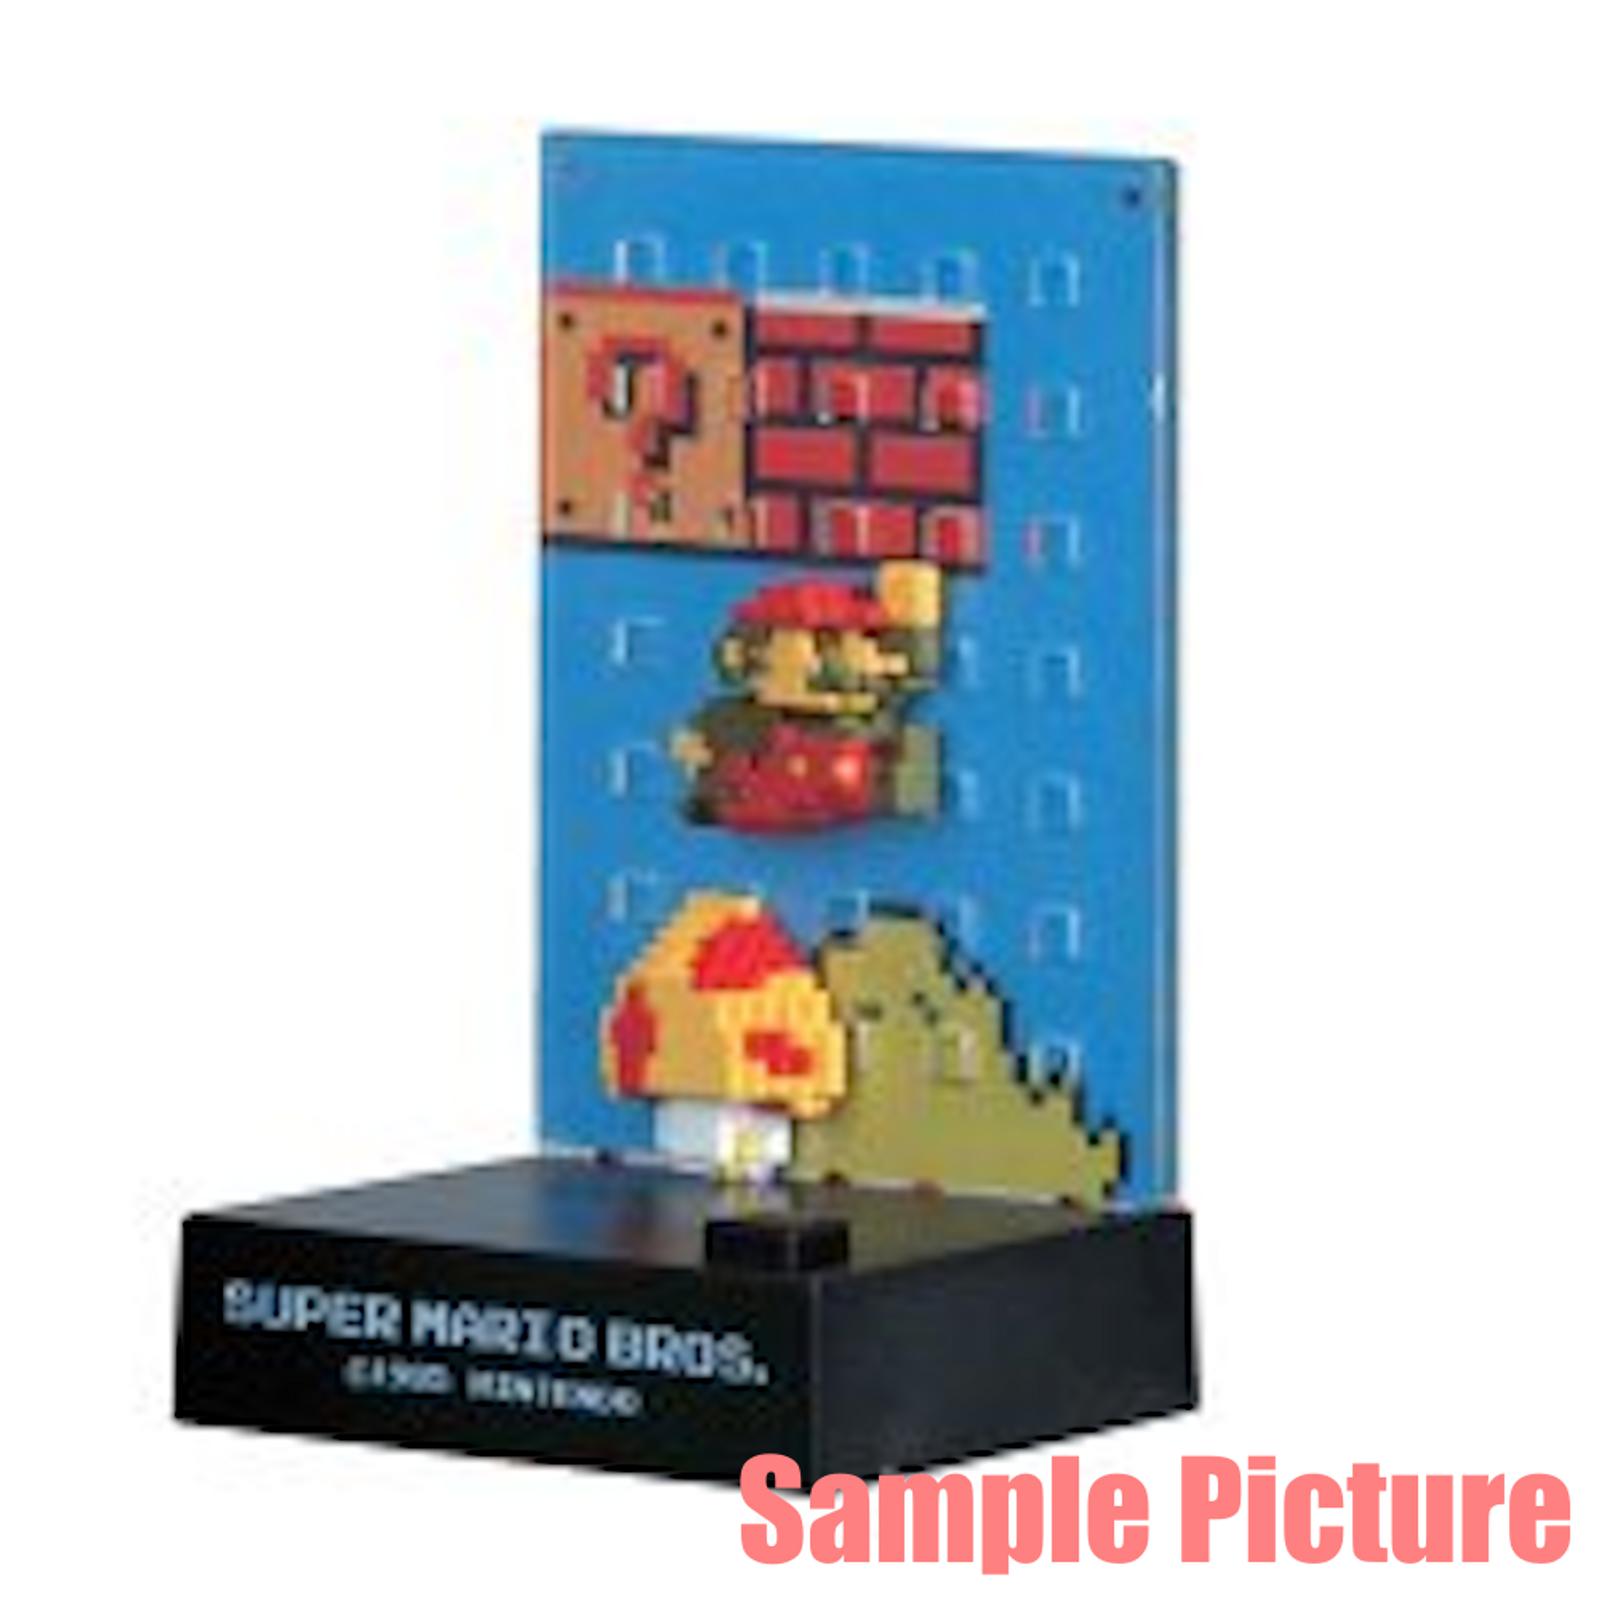 RARE! Nintendo Dotgraphics Super Mario Bros. Figure with Game Sound